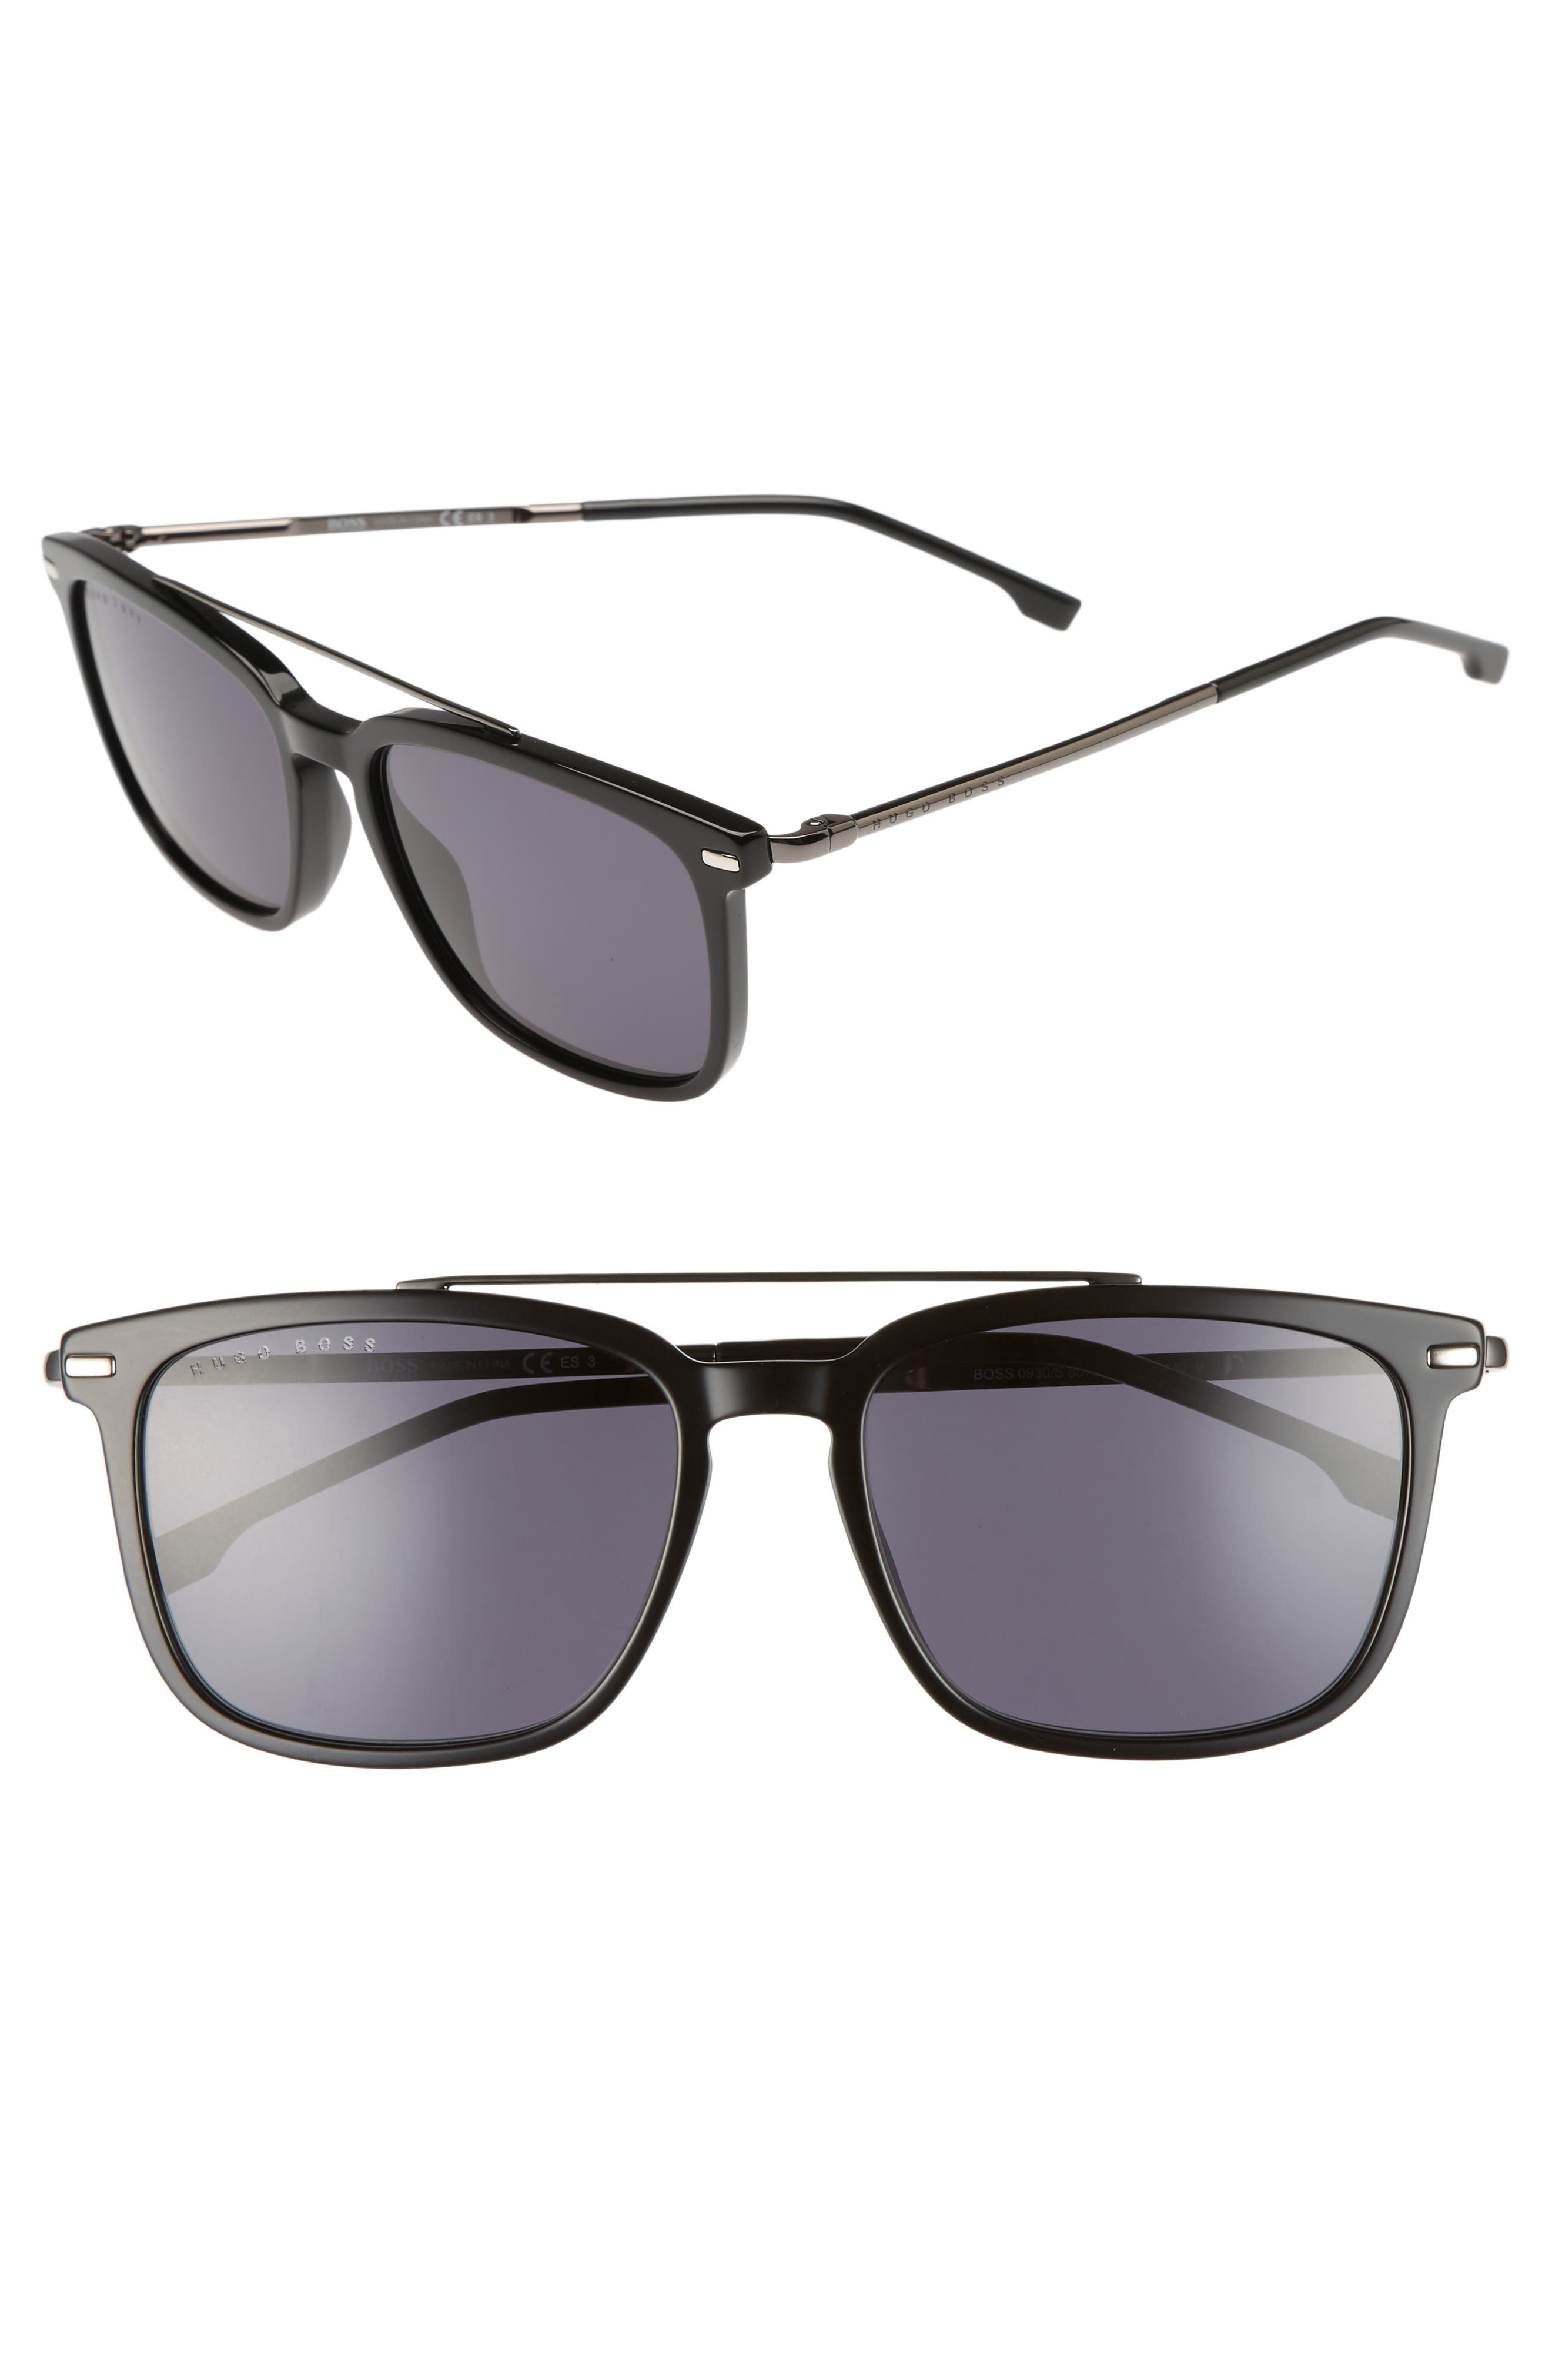 55mm Polarized Sunglasses,                         Main,                         color, BLACK